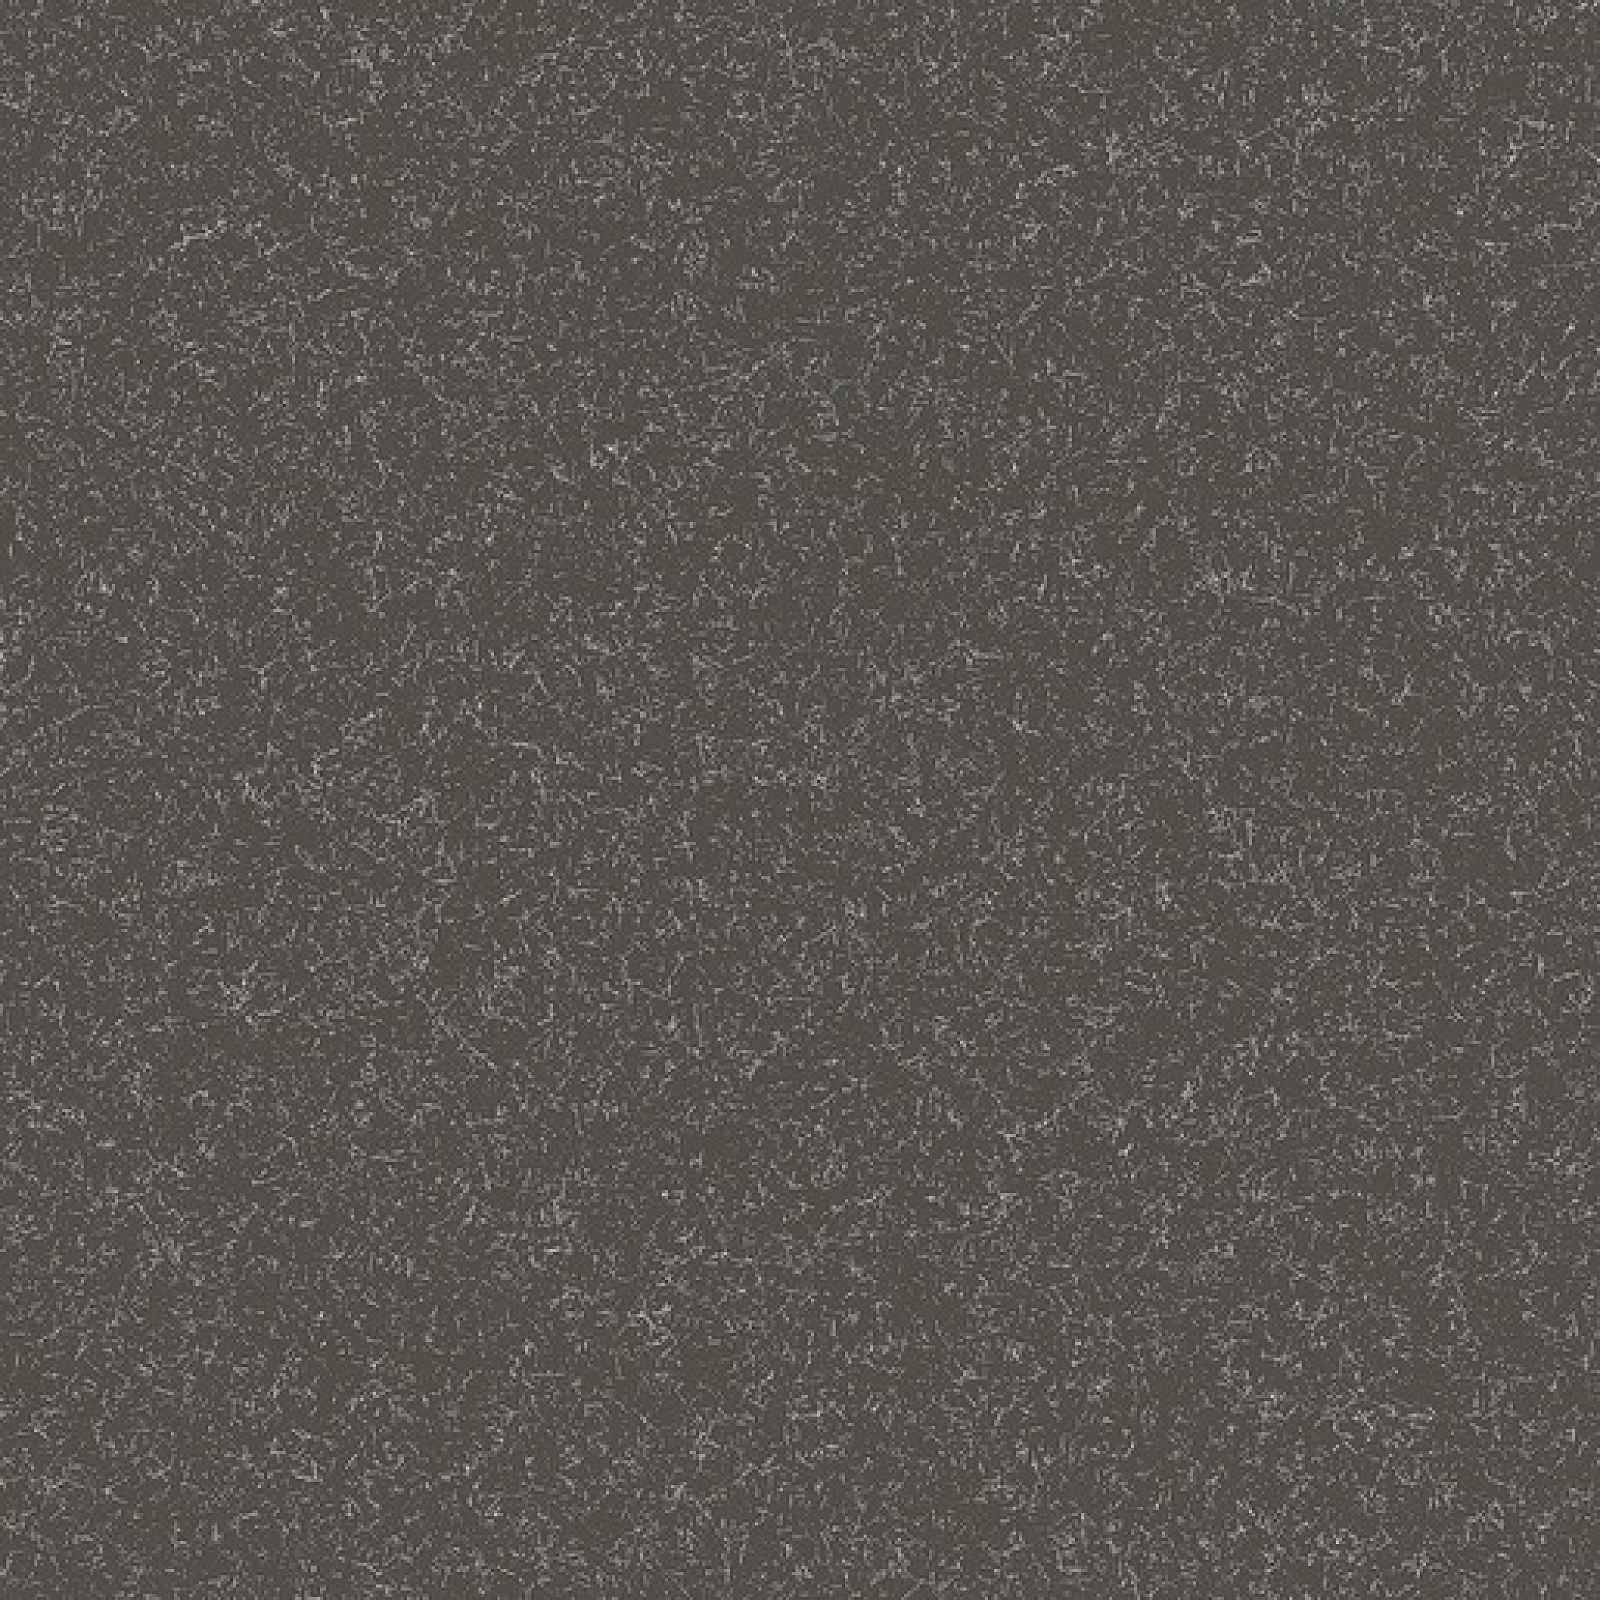 Dlažba RAKO Linka černá 60x60 cm mat DAK63822.1